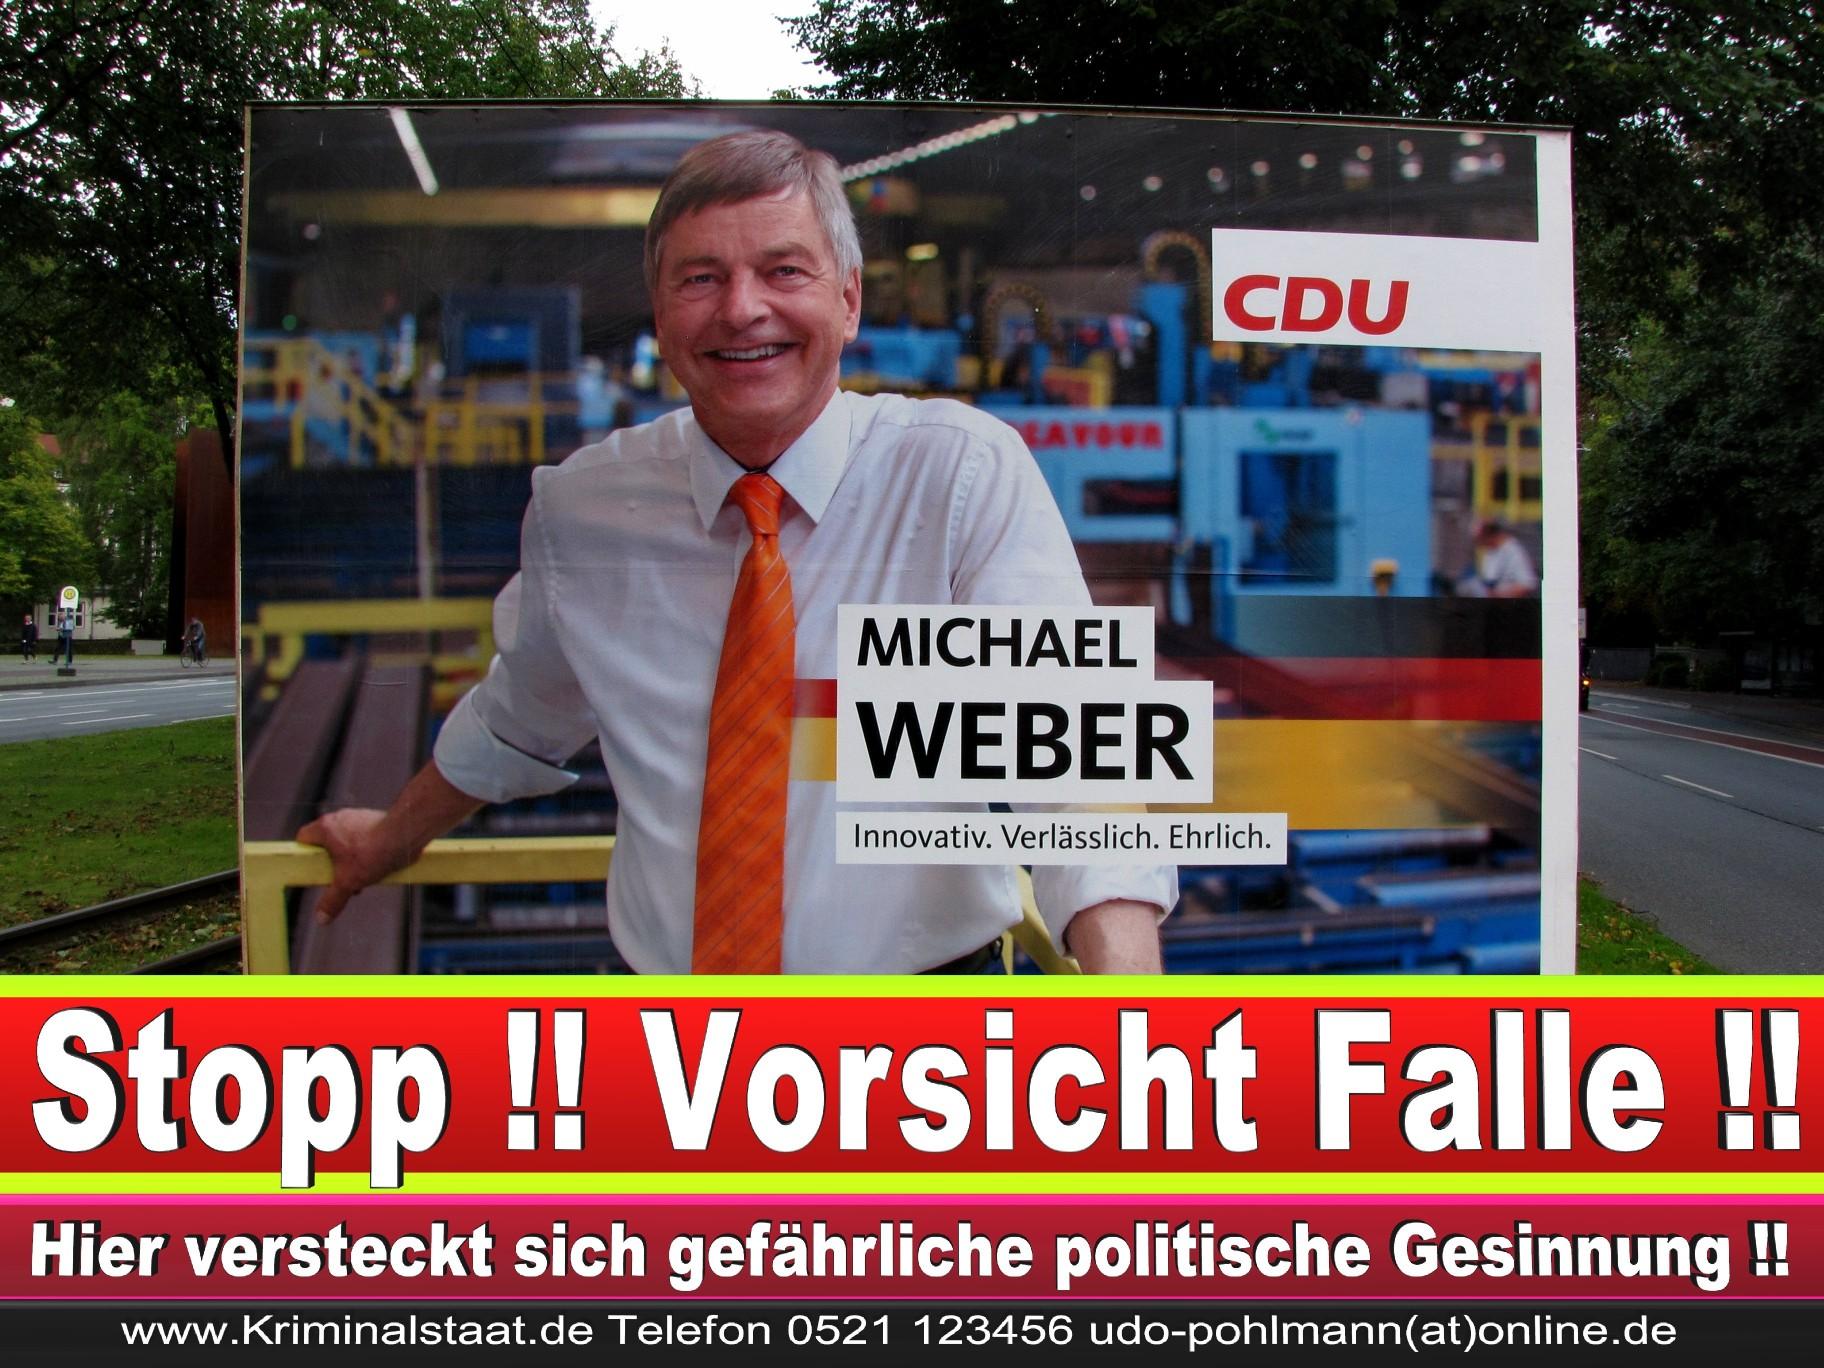 Michael Weber CDU Wahlplakat Wahlwerbung Bielefeld Volksverhetzung Durch Religion 3